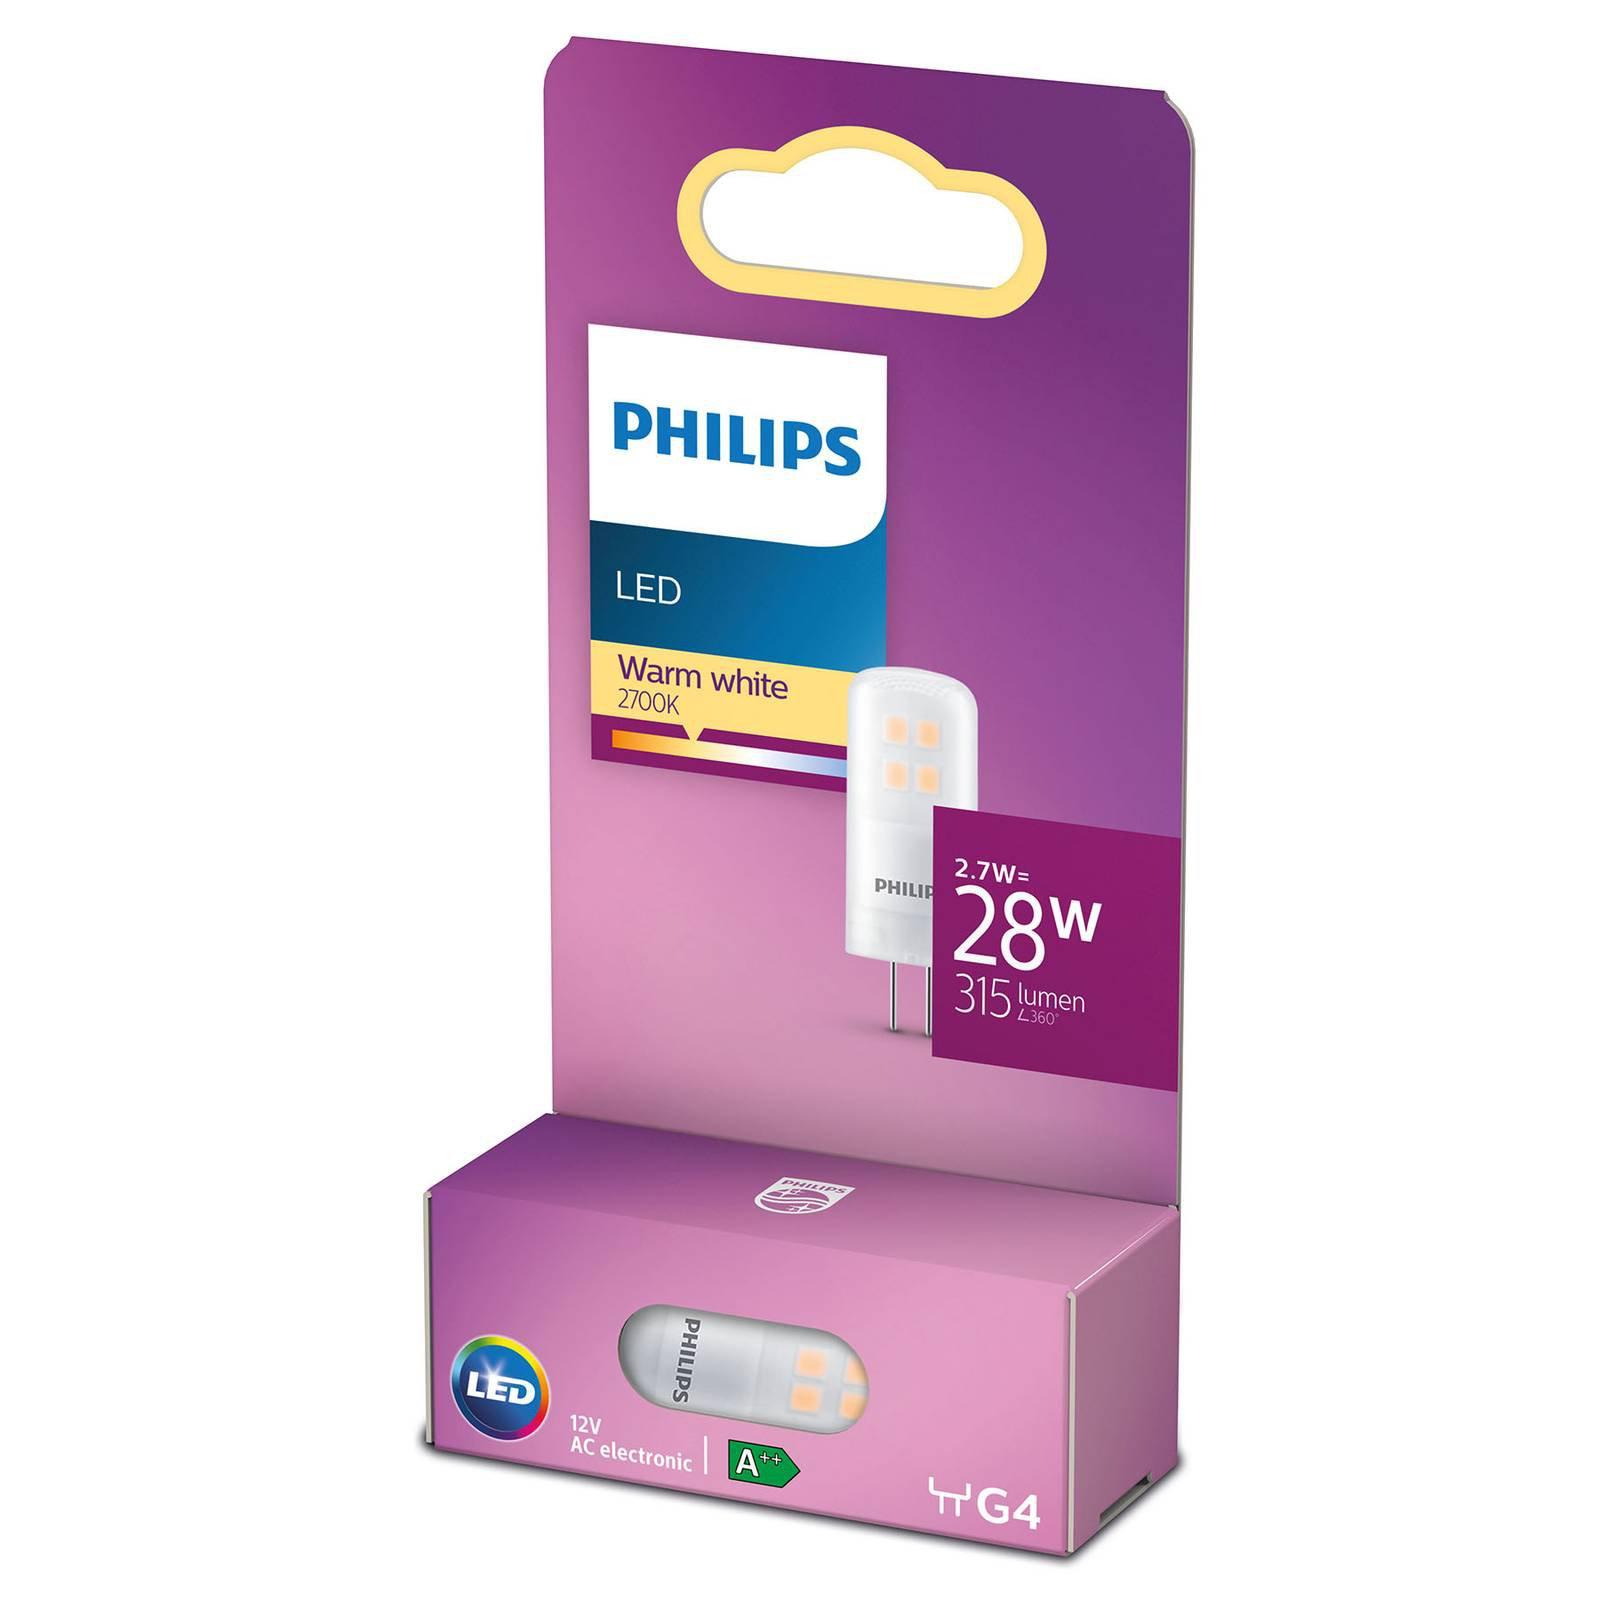 Philips LED-stiftpære G4 2,7 W 2 700 K matt